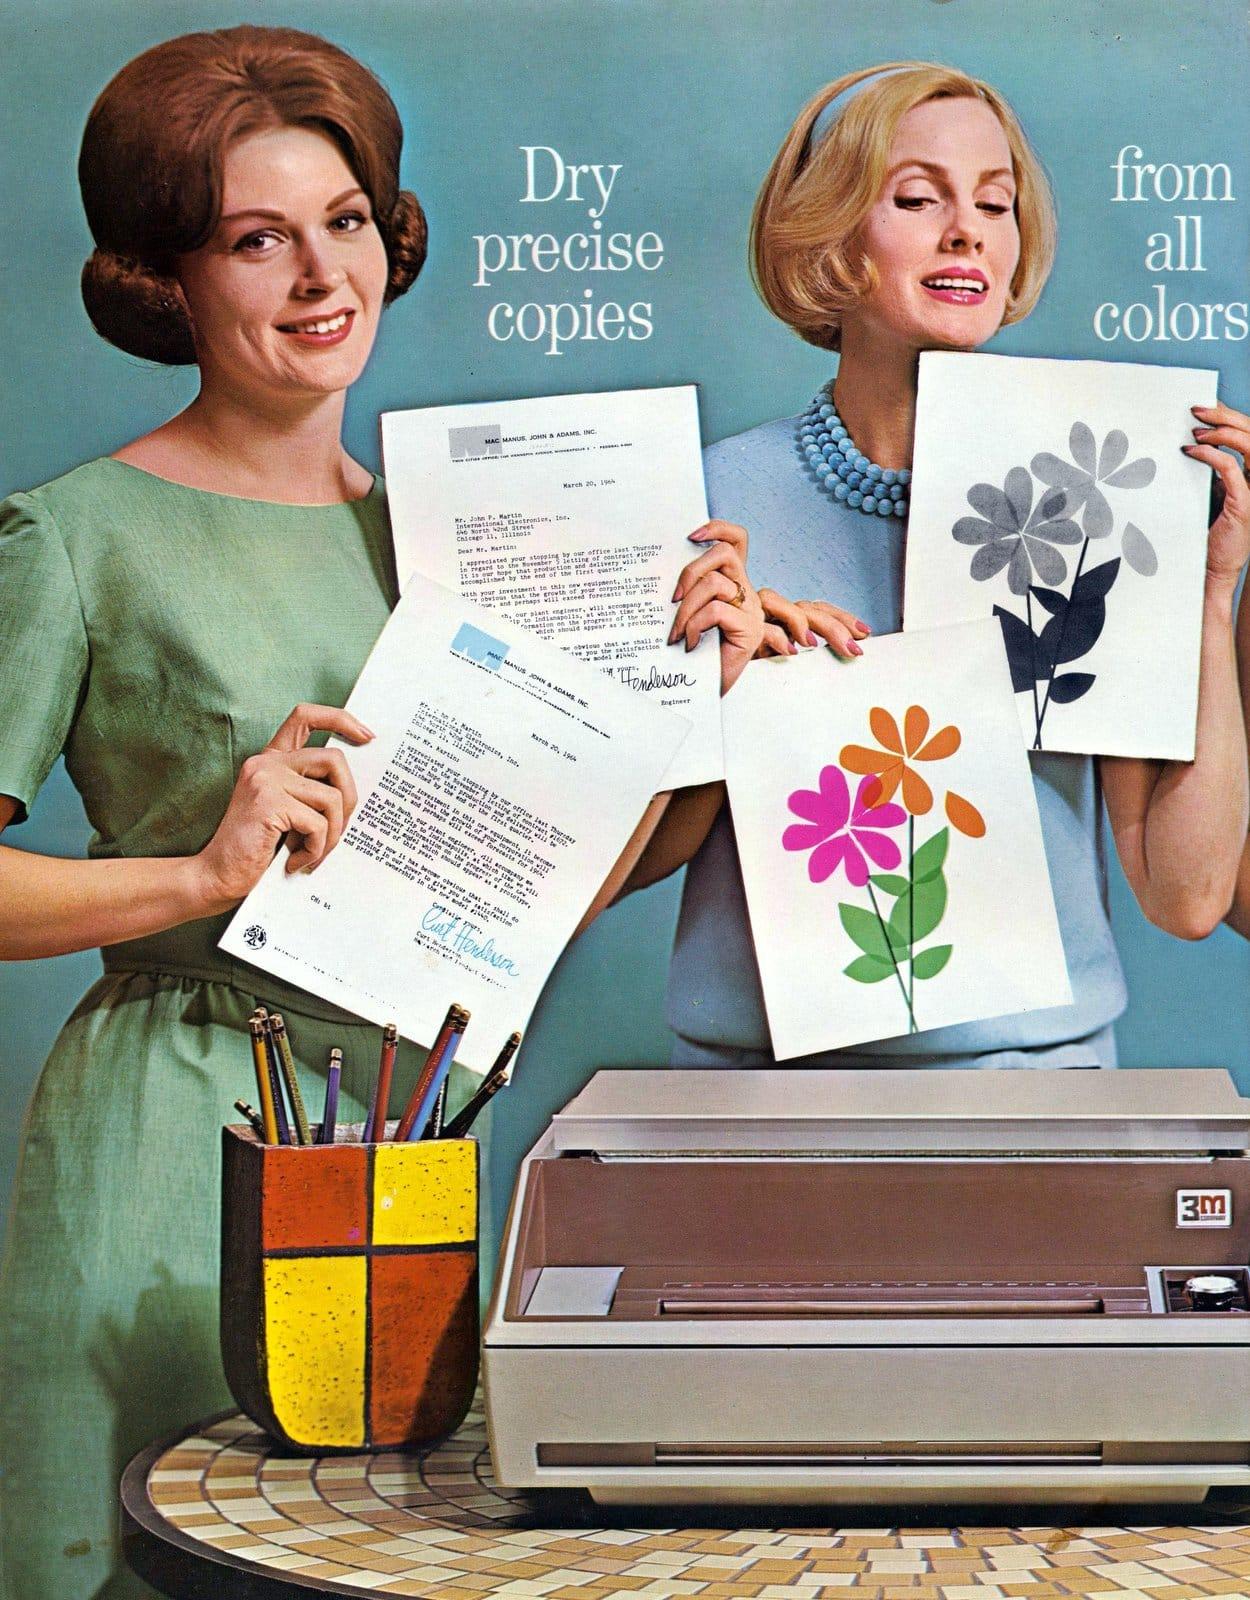 Vintage 3M office equipment - dry photocopier 107 (1963)